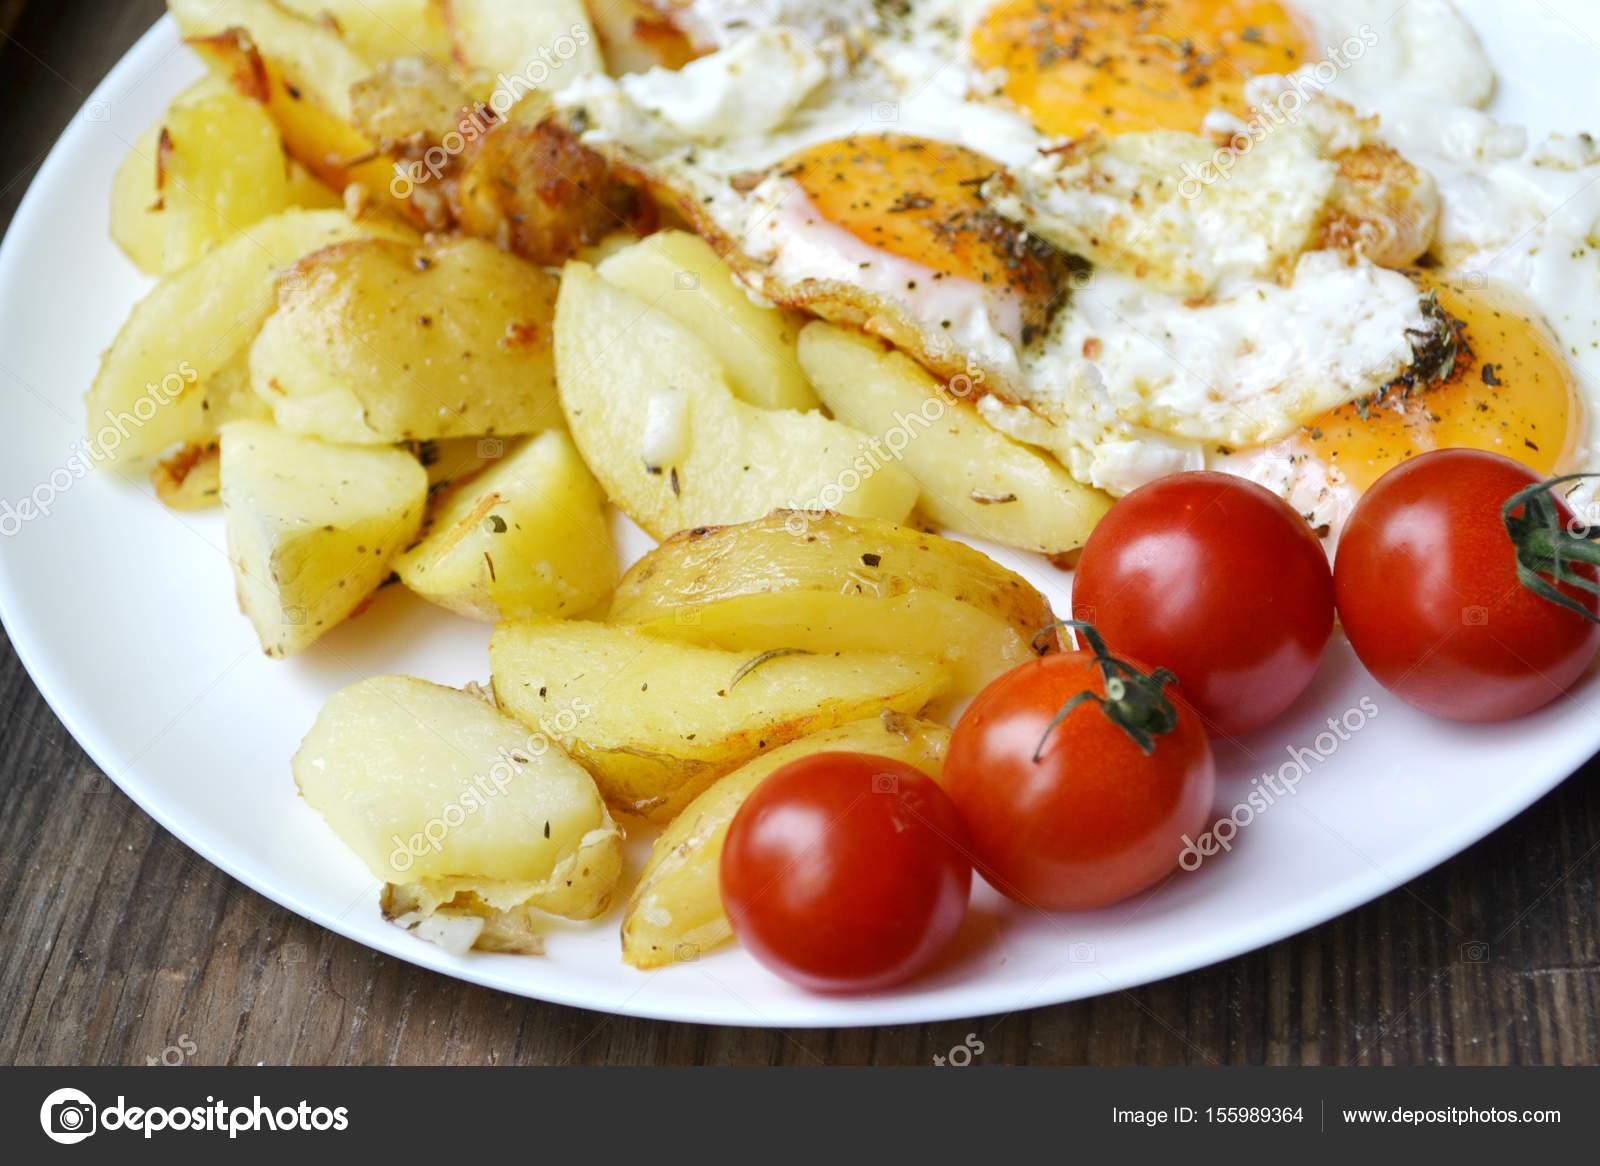 tarif: yumurtalı patates kızartması video [36]